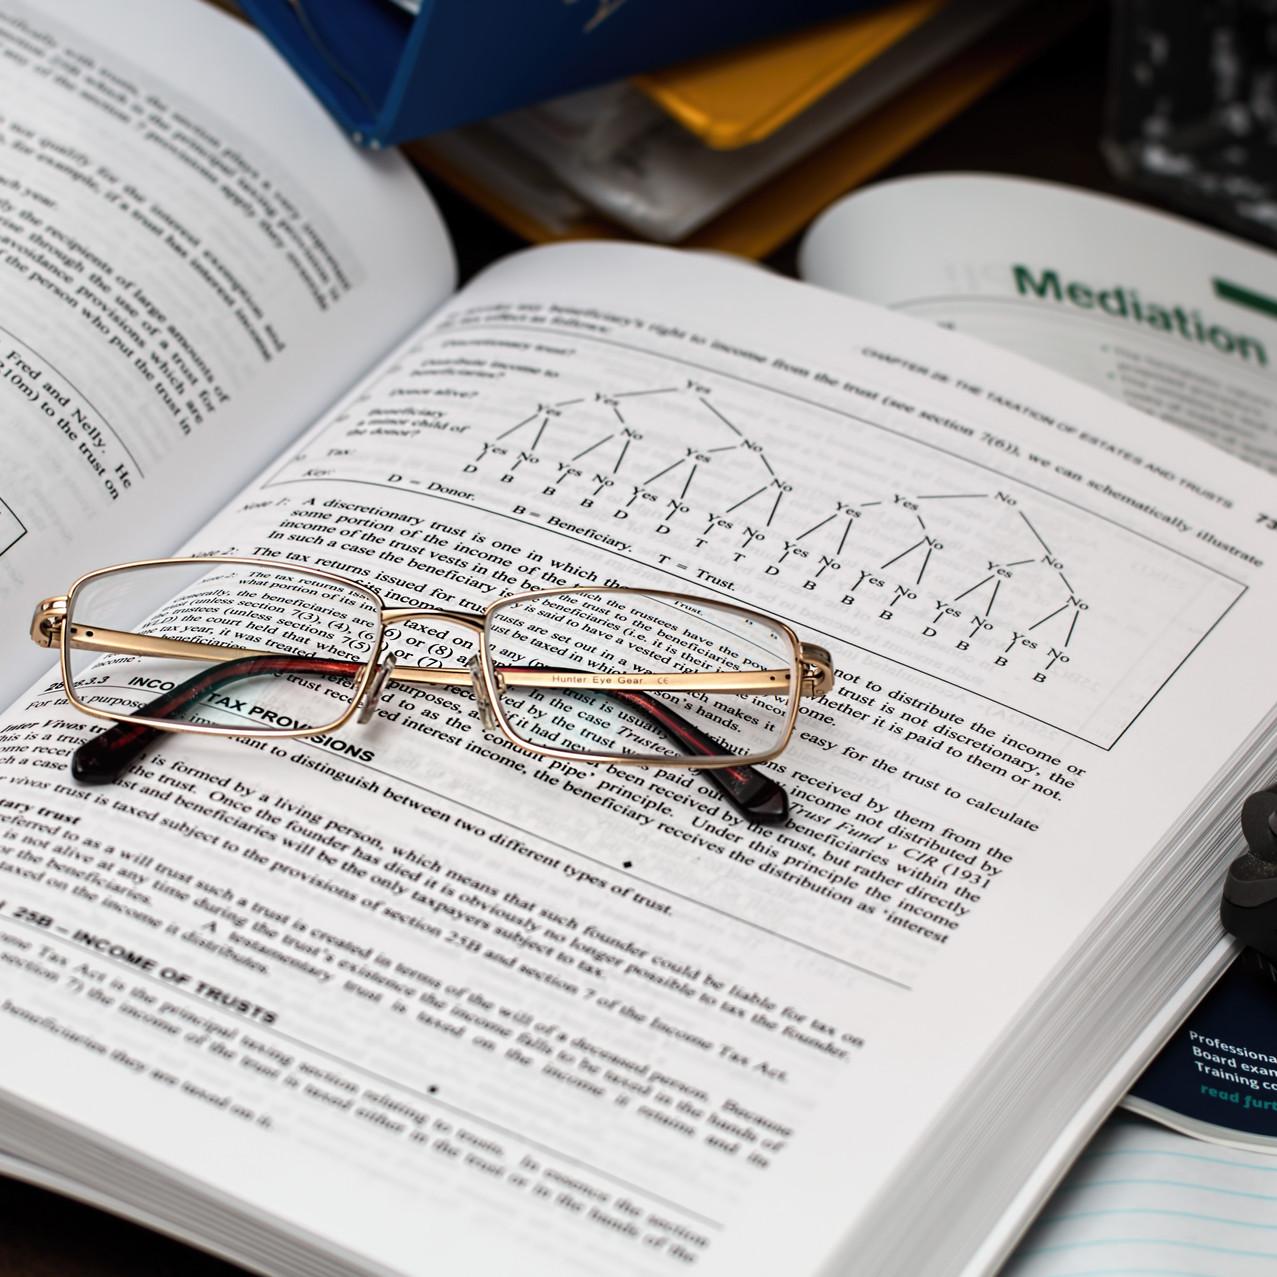 eyeglasses on open workbook